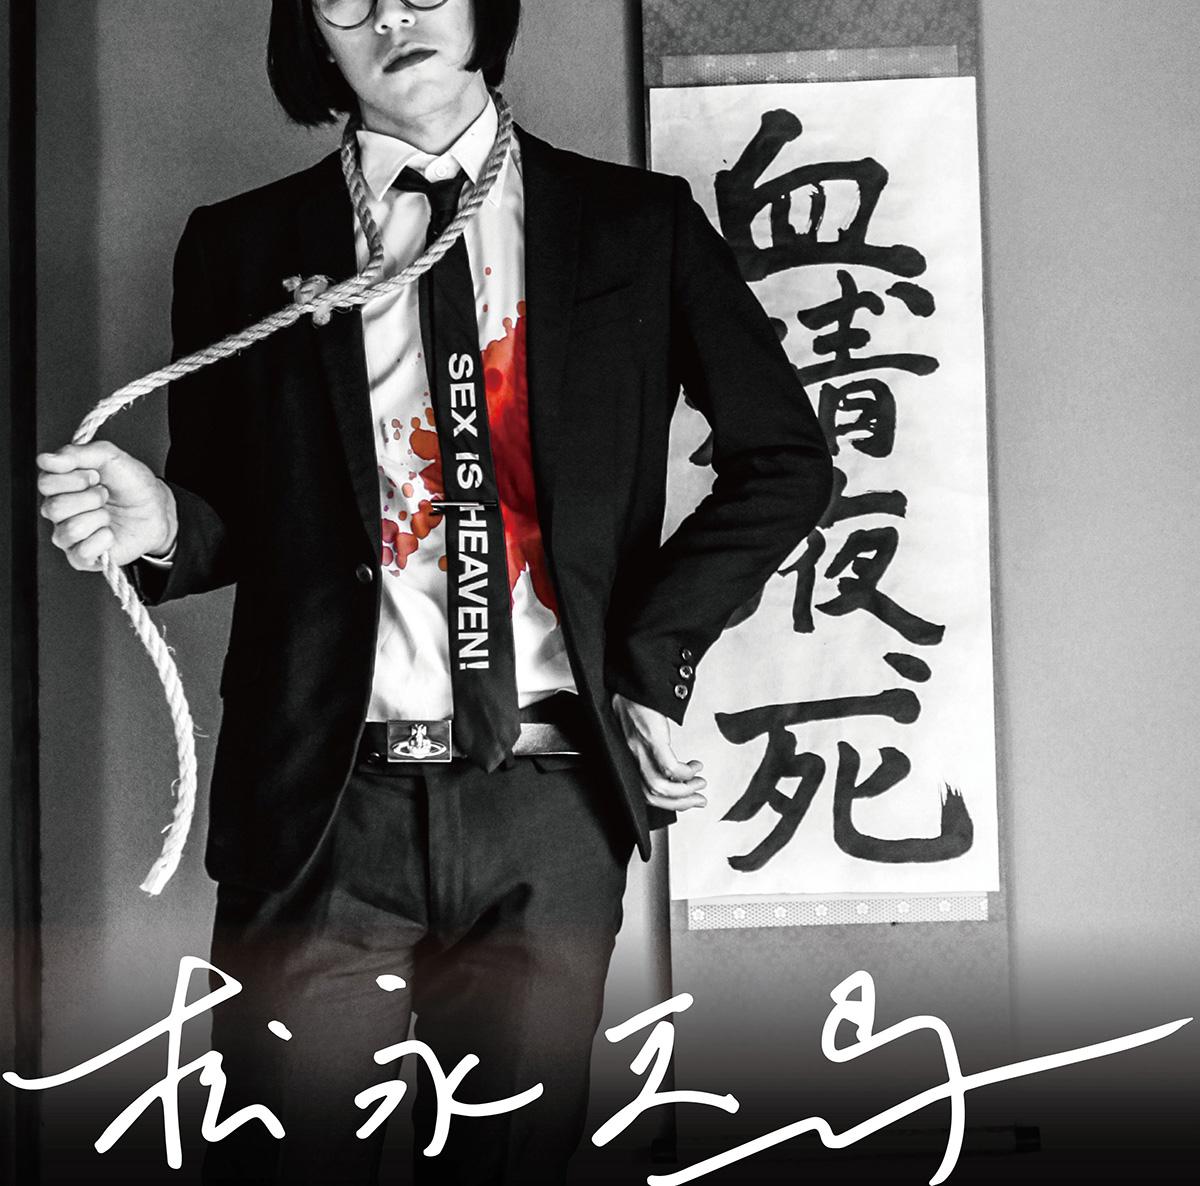 RMMS-URBANGARDE-Temma-Matsunaga-CD-limited